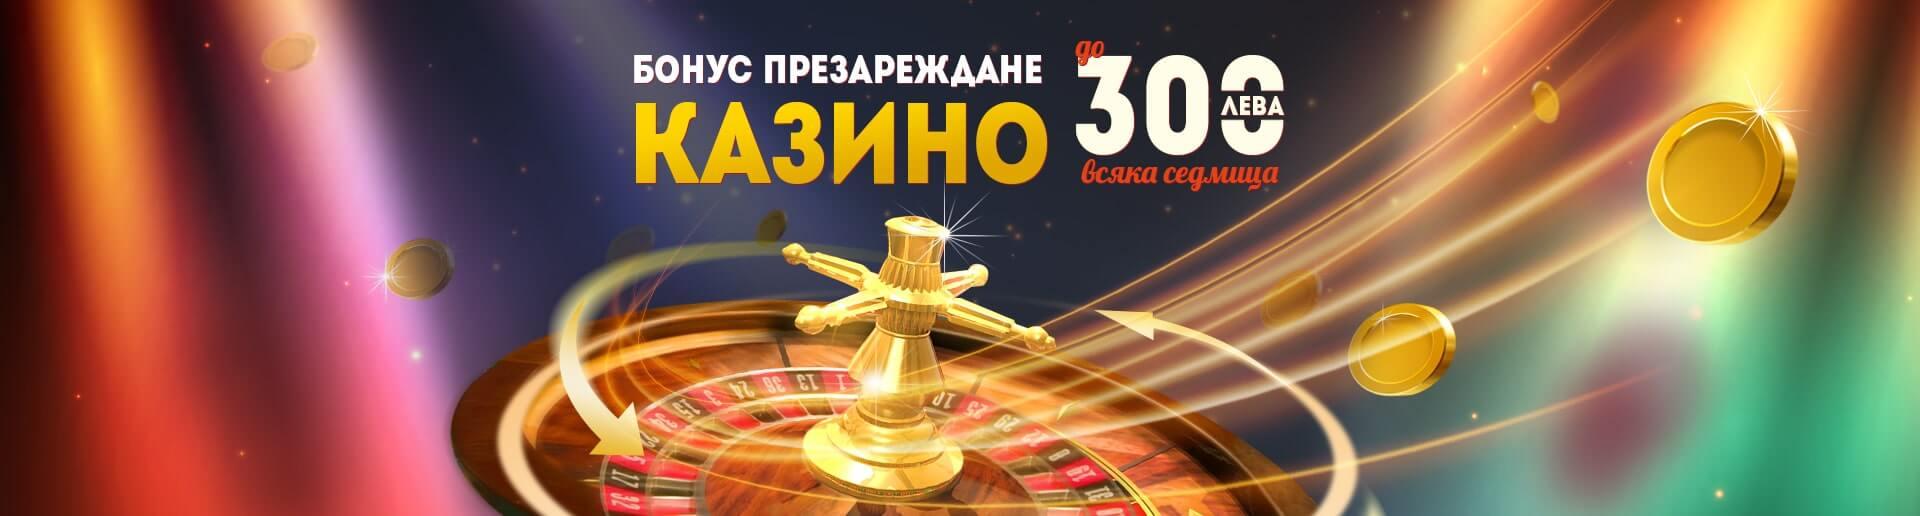 xbet.bg-winbet-casino-deposit-300